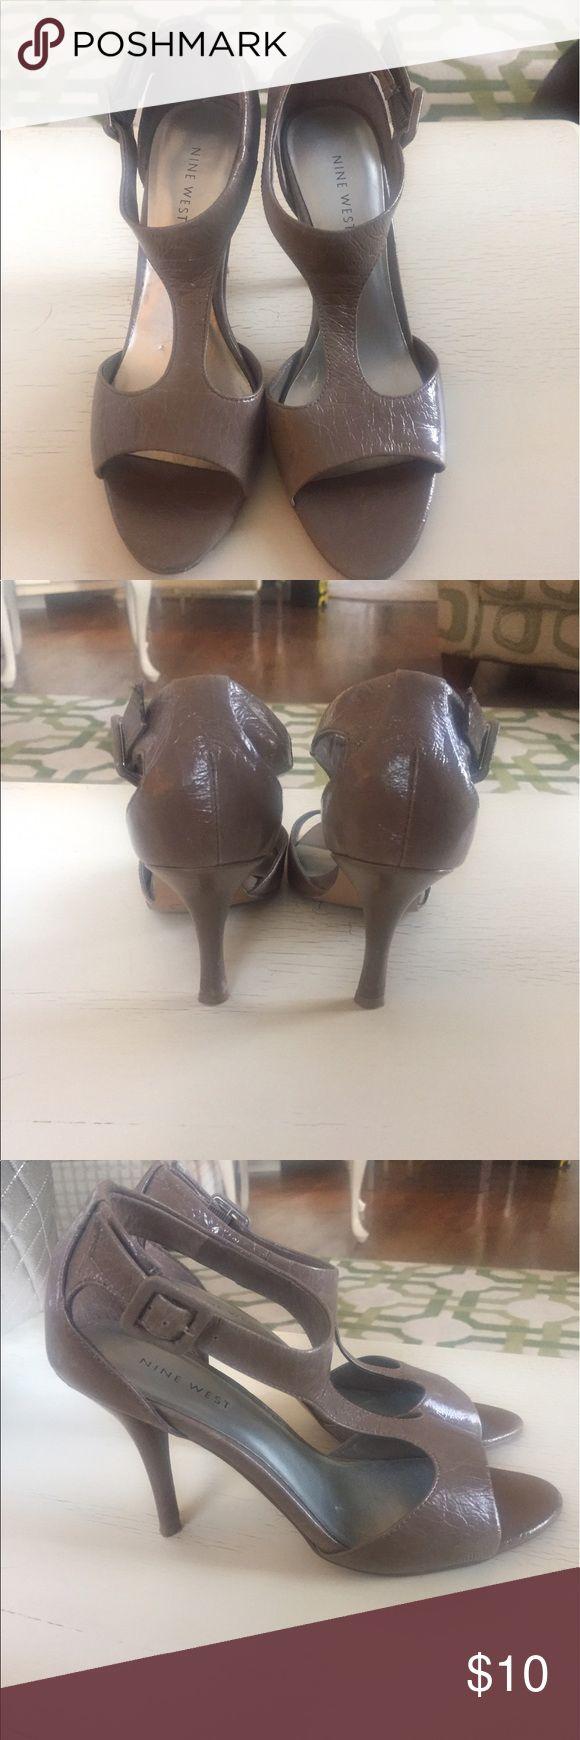 Nine West Tan Heels Size 7.5 Tan Nine West Heels Nine West Shoes Heels